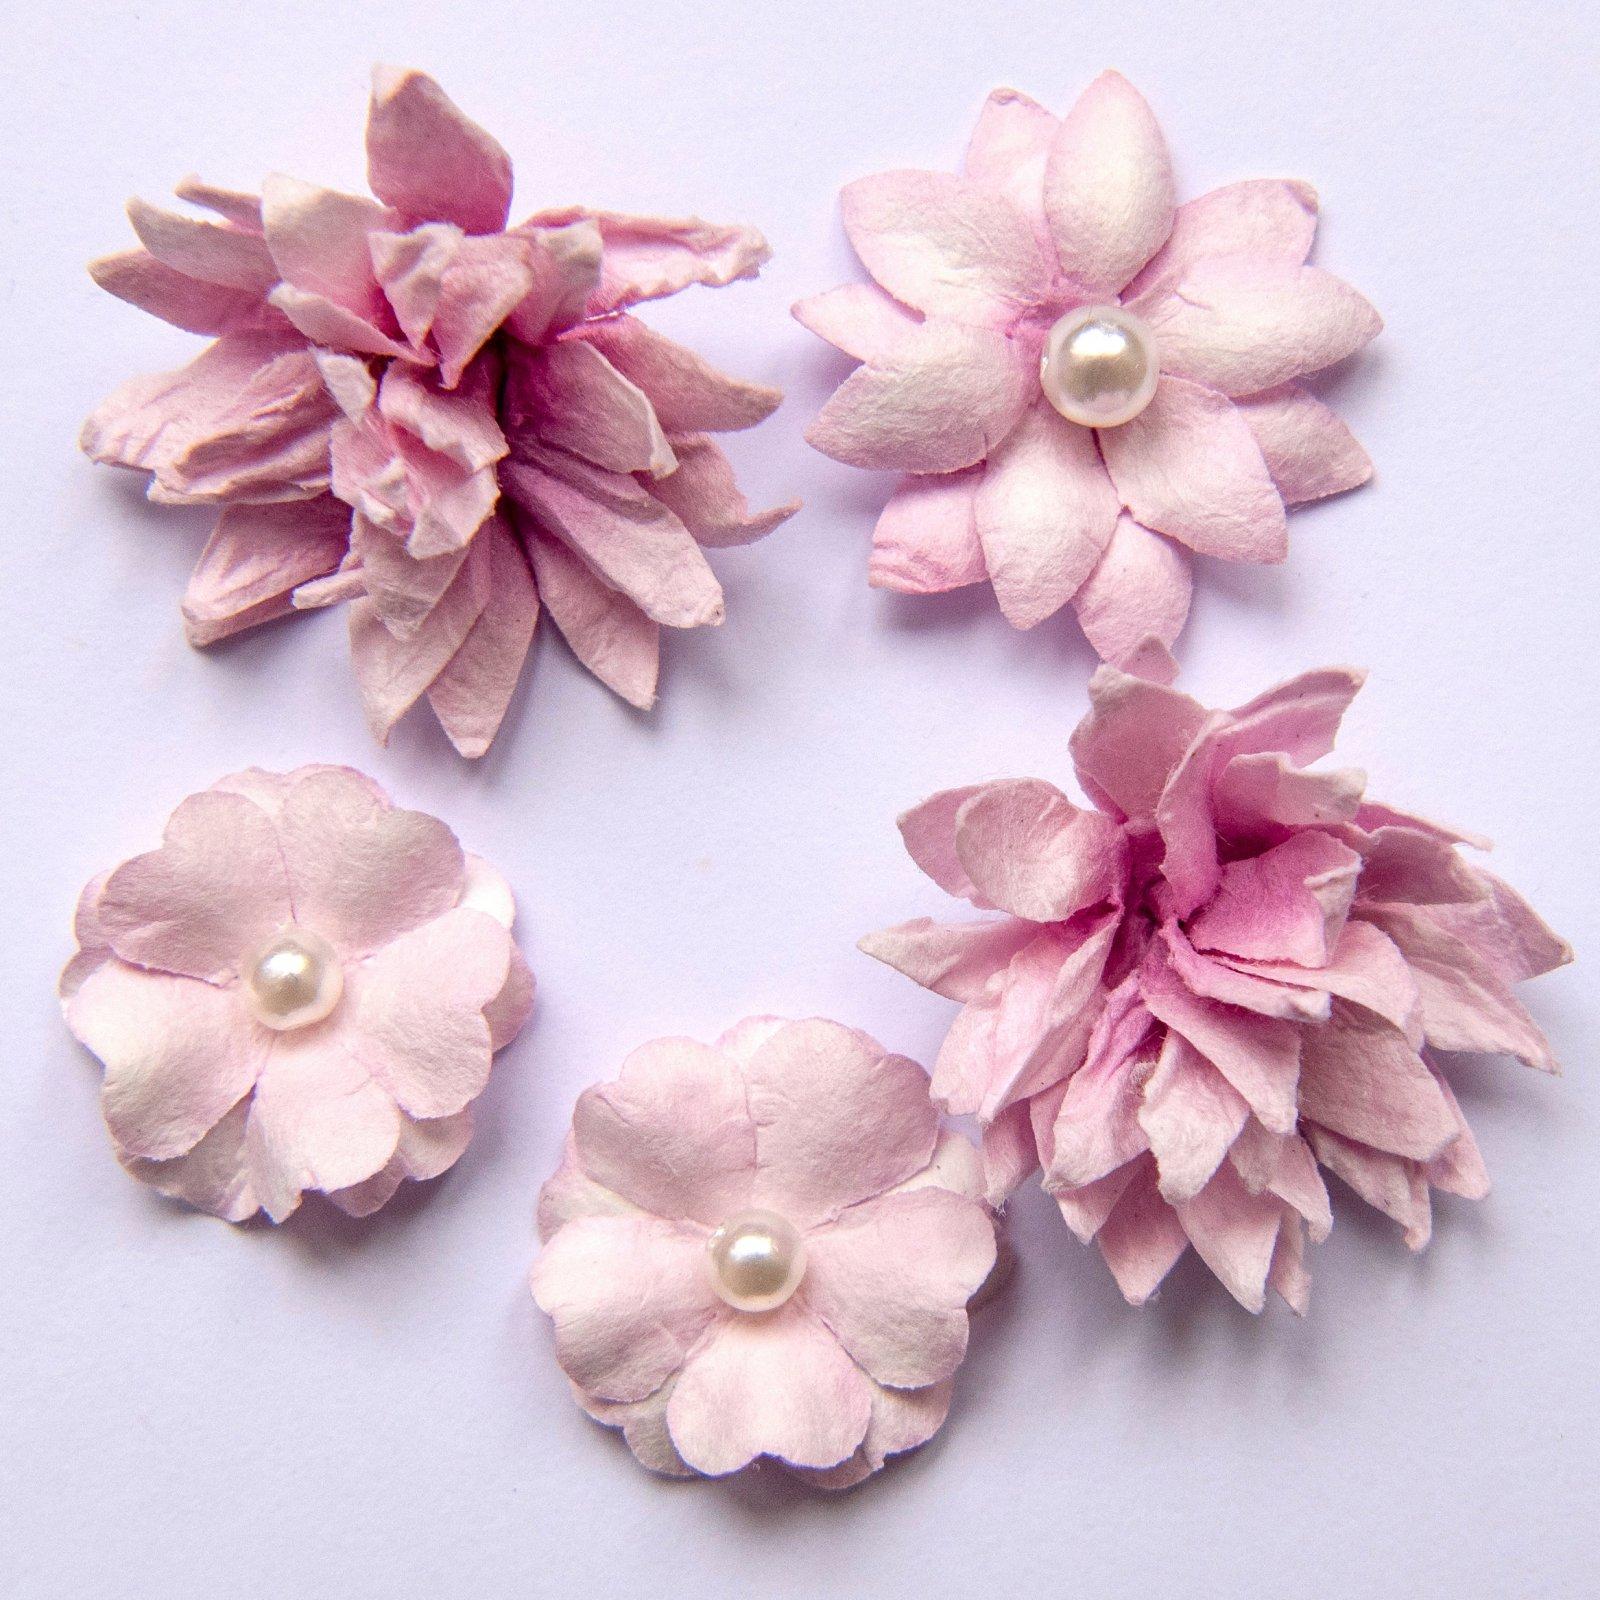 FLOWER MINI SERIES NO.1 - PUNCH